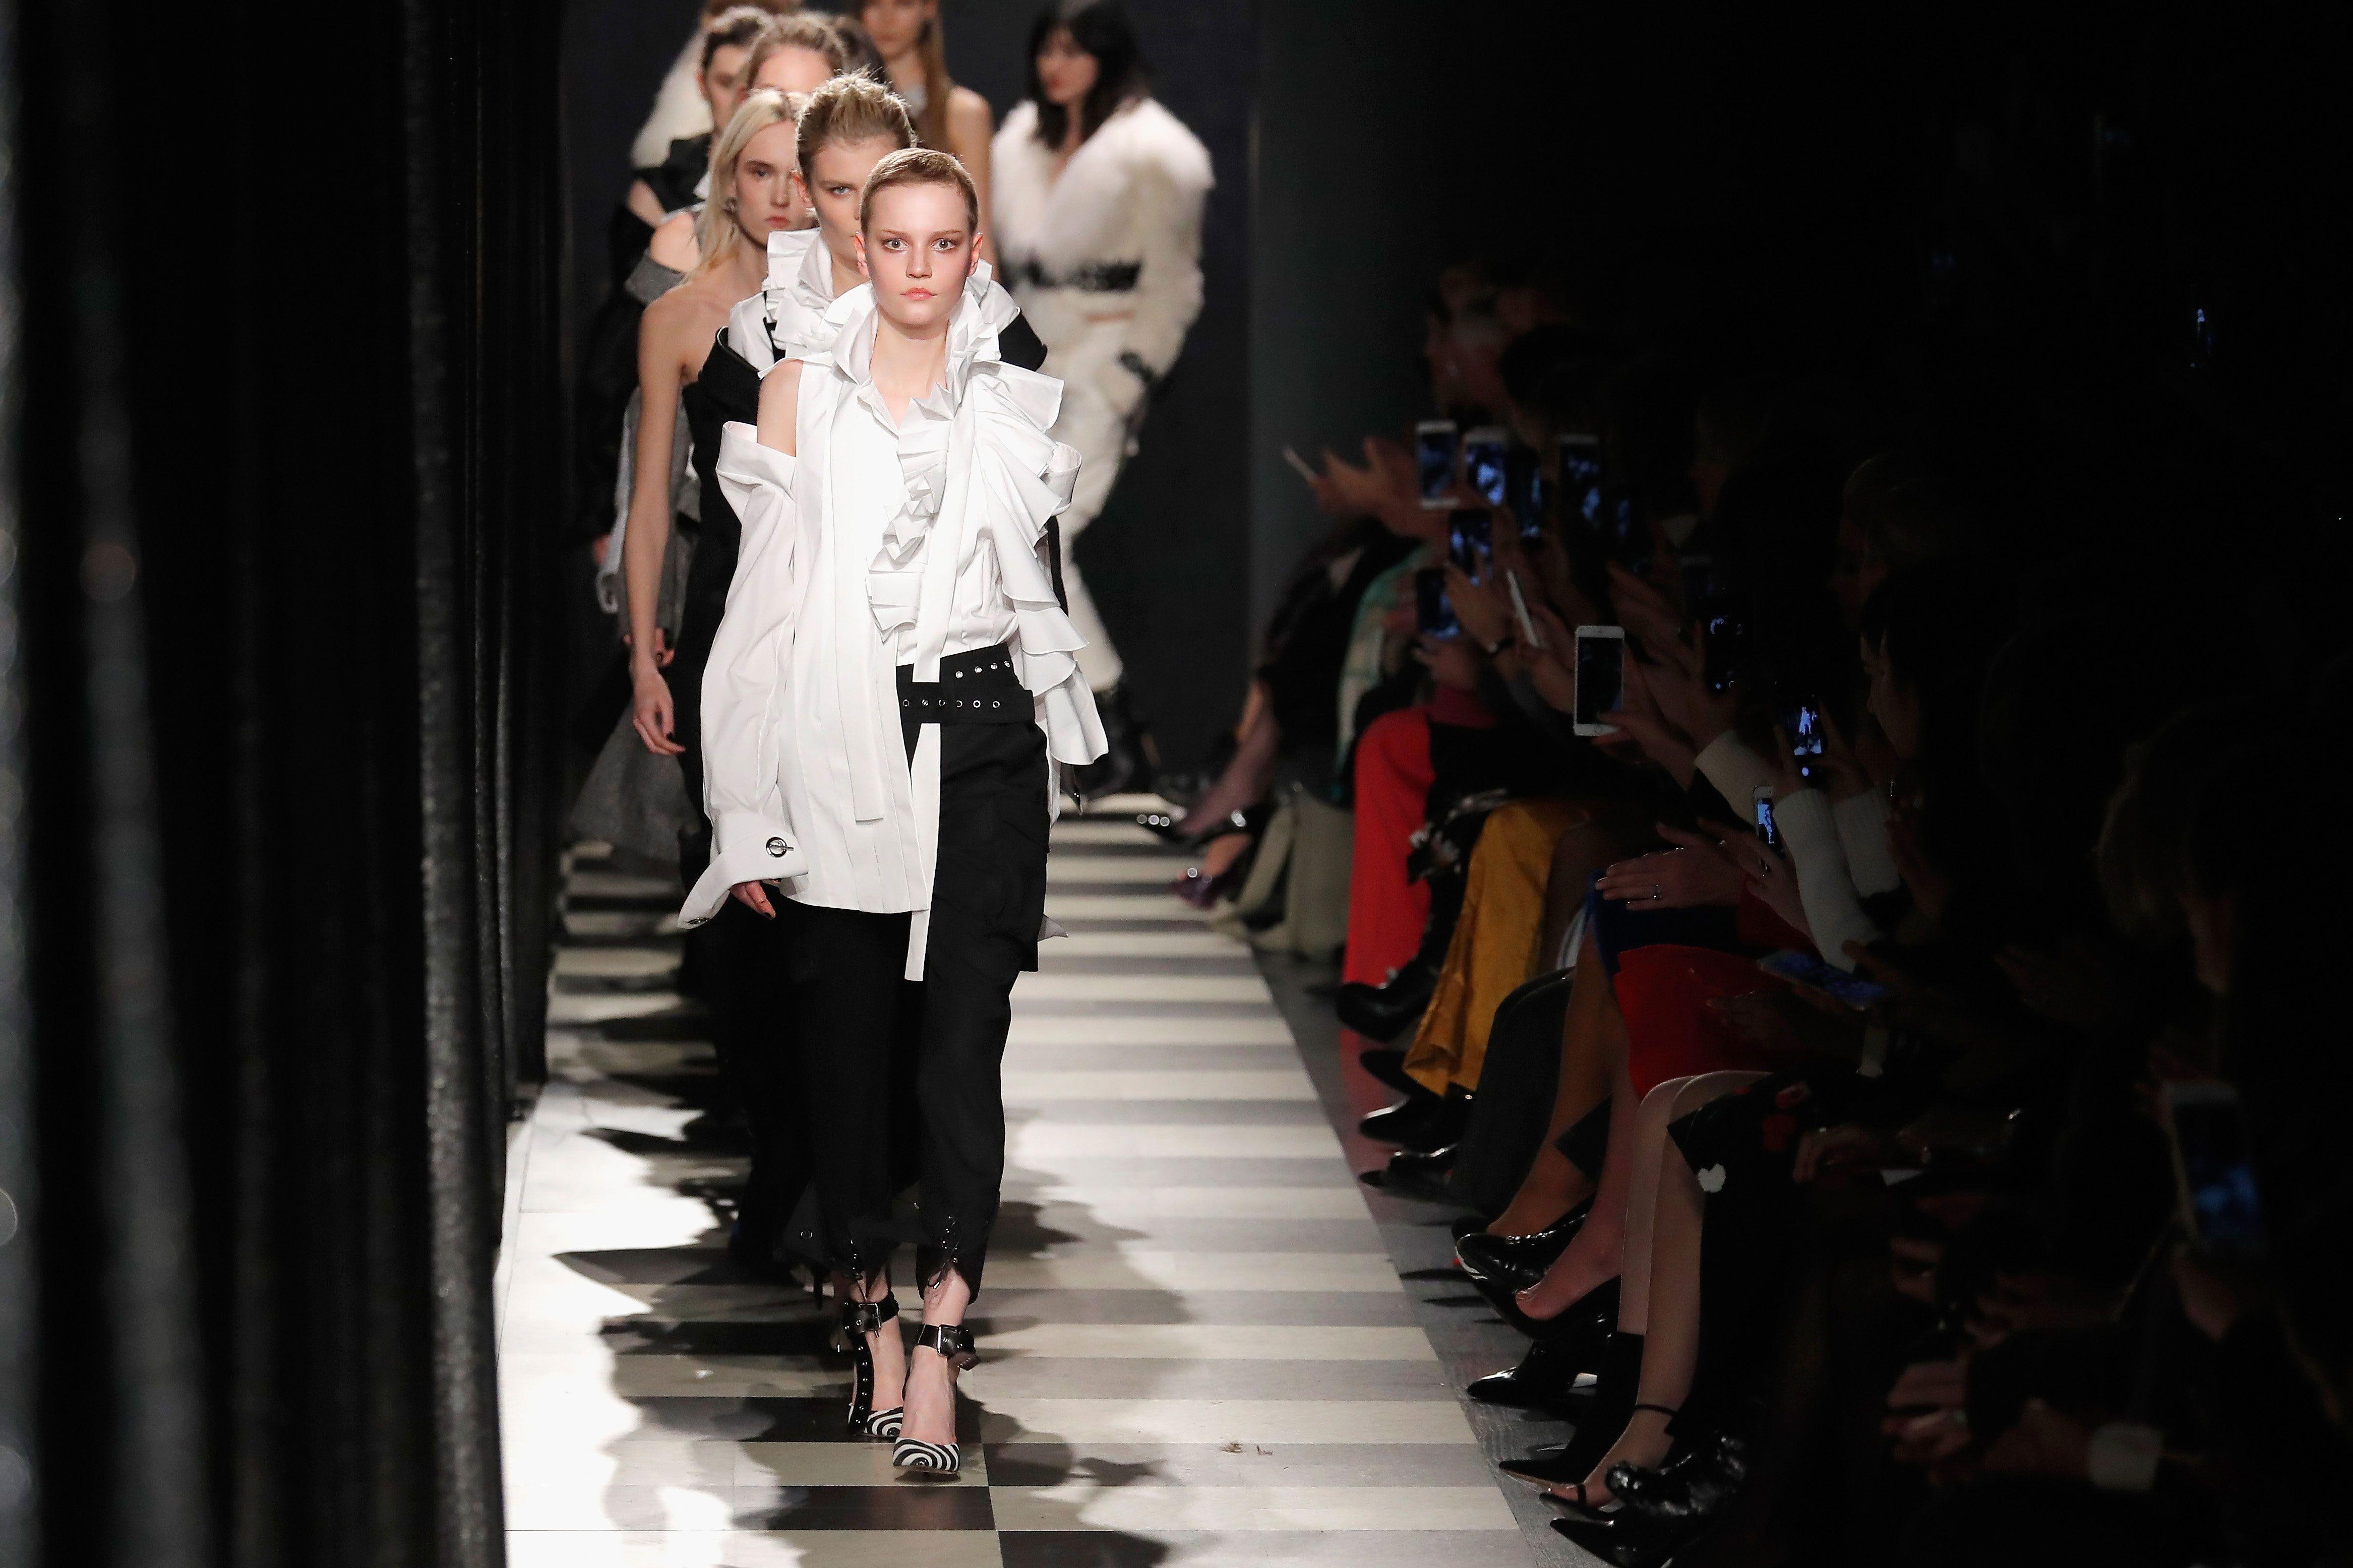 Wayne Rogers Clothing Designer | Oscar De La Renta Designer Fashion Label